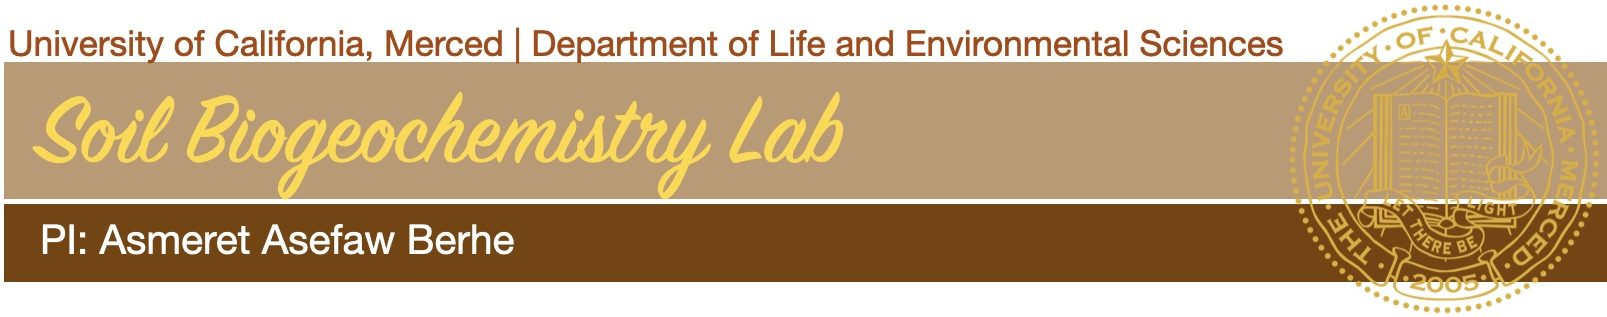 Soil Biogeochemistry Lab @ UC Merced